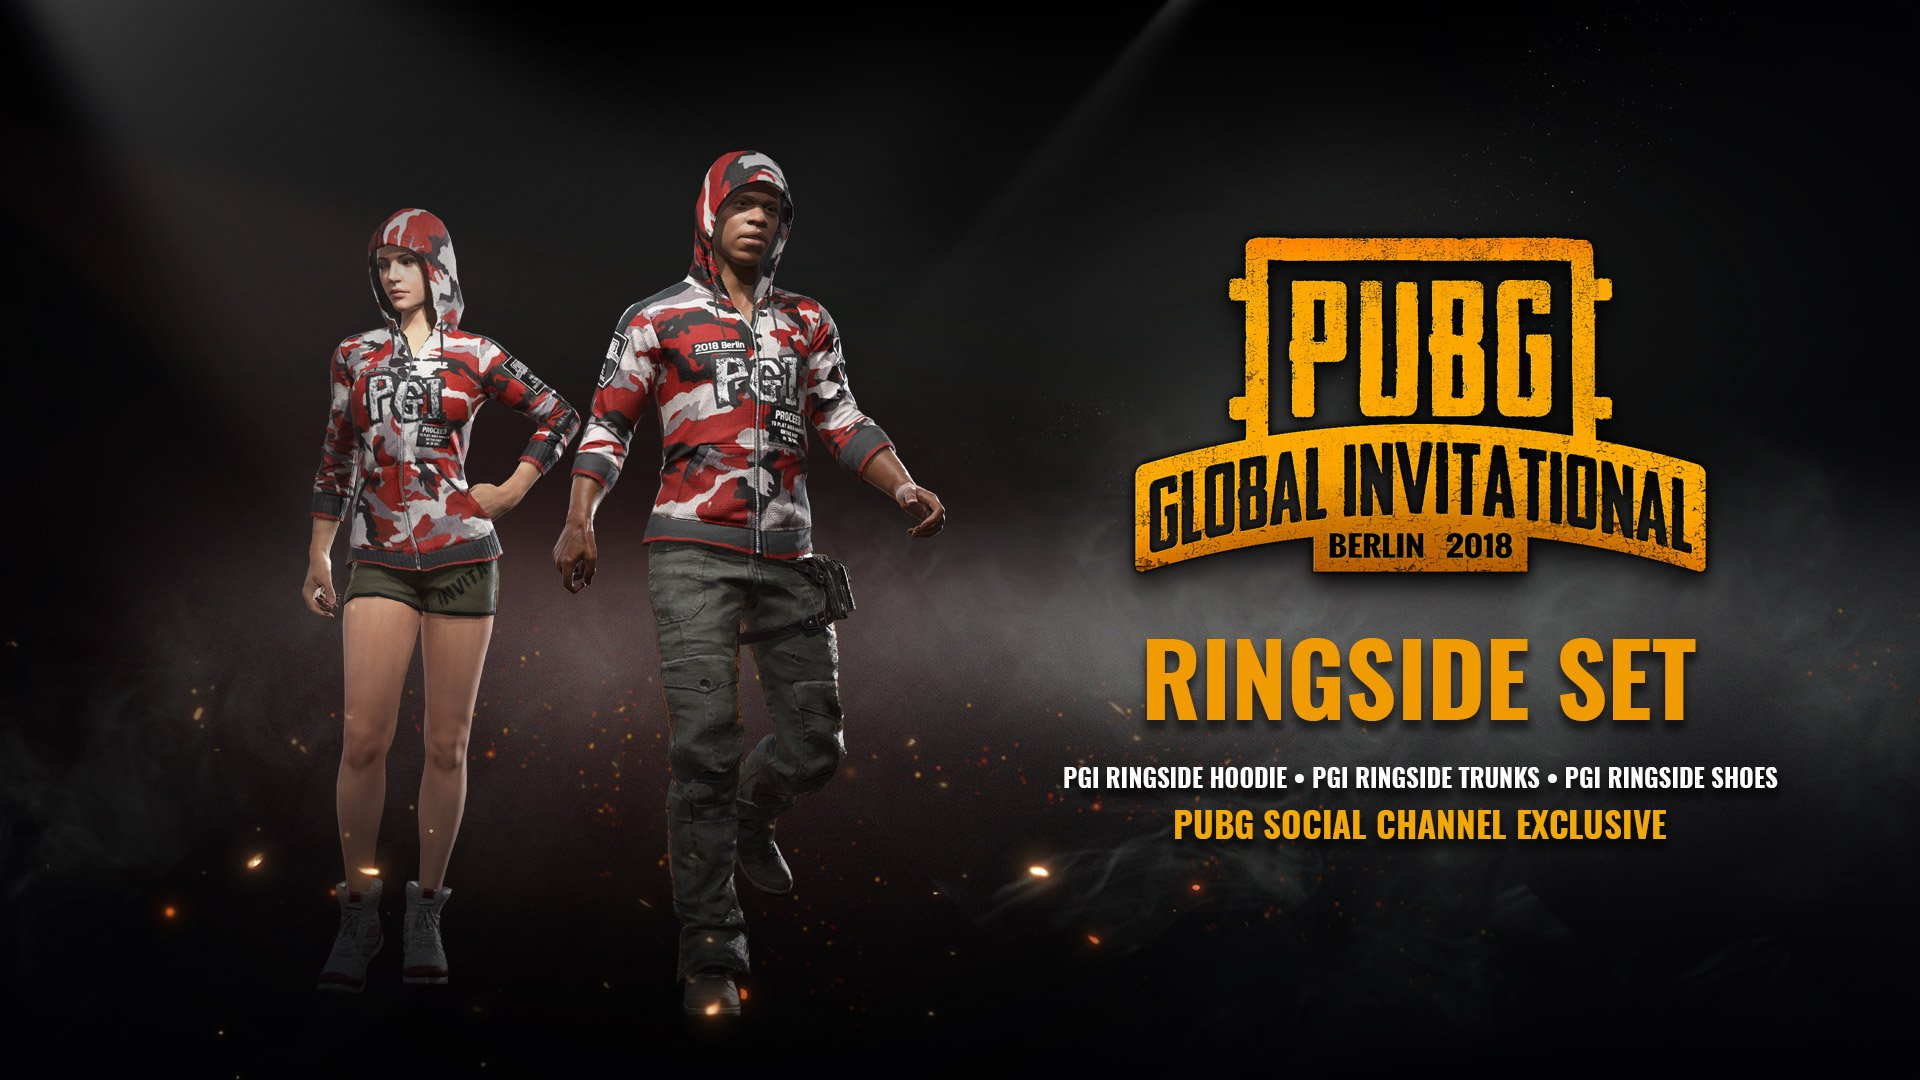 pubg event poster